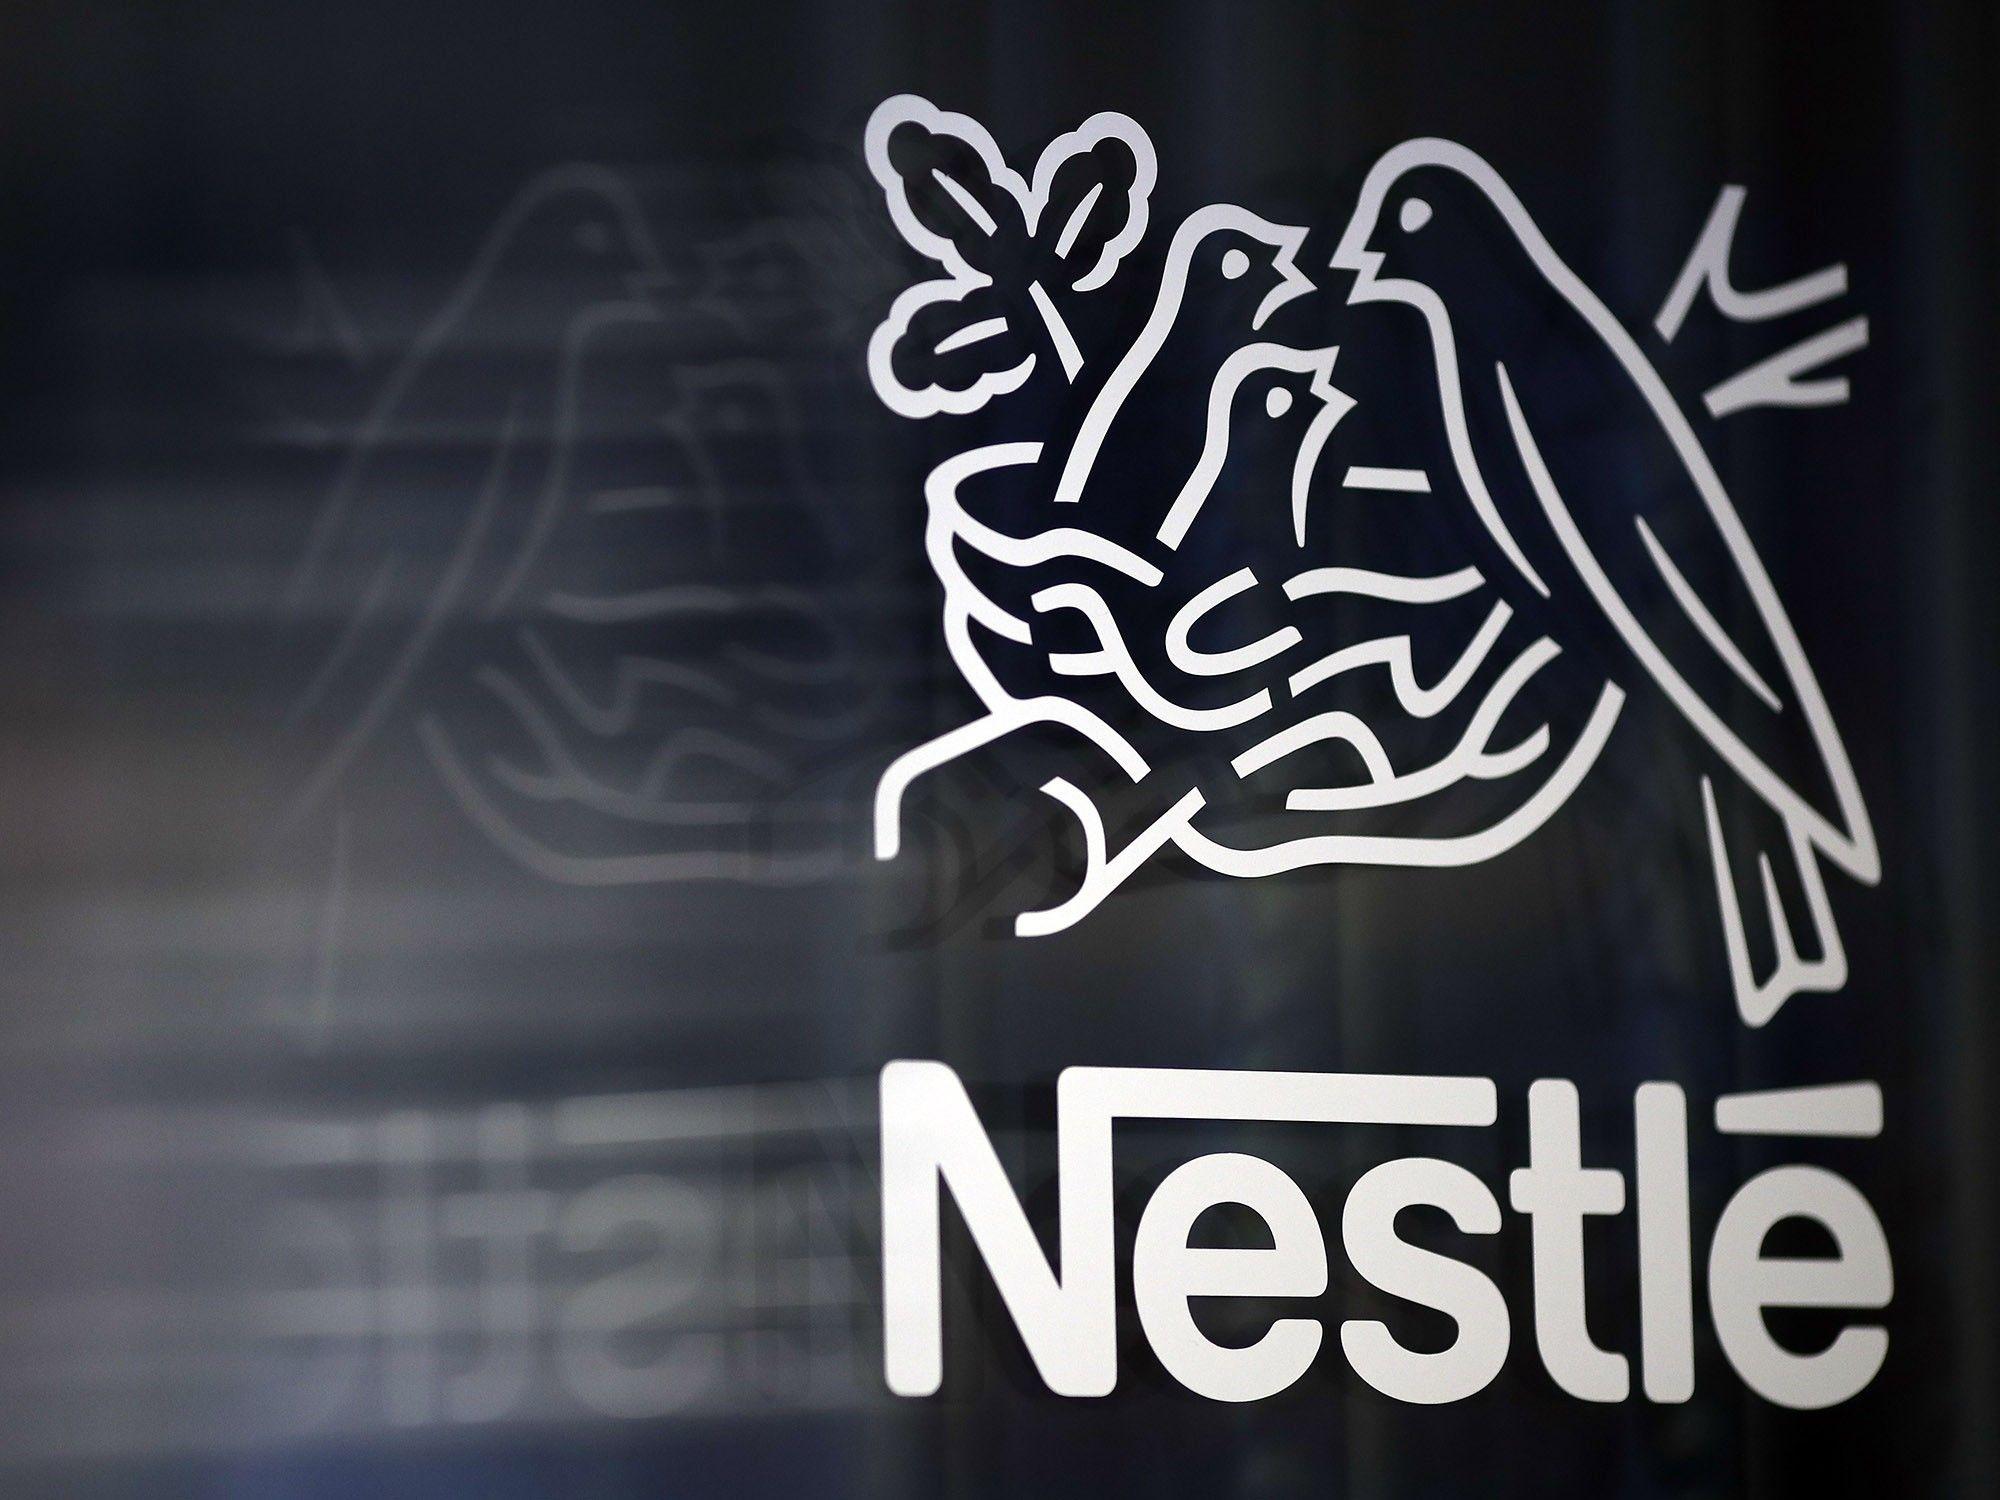 Nestlé prevé elevar compras de granos de café premium en Brasil